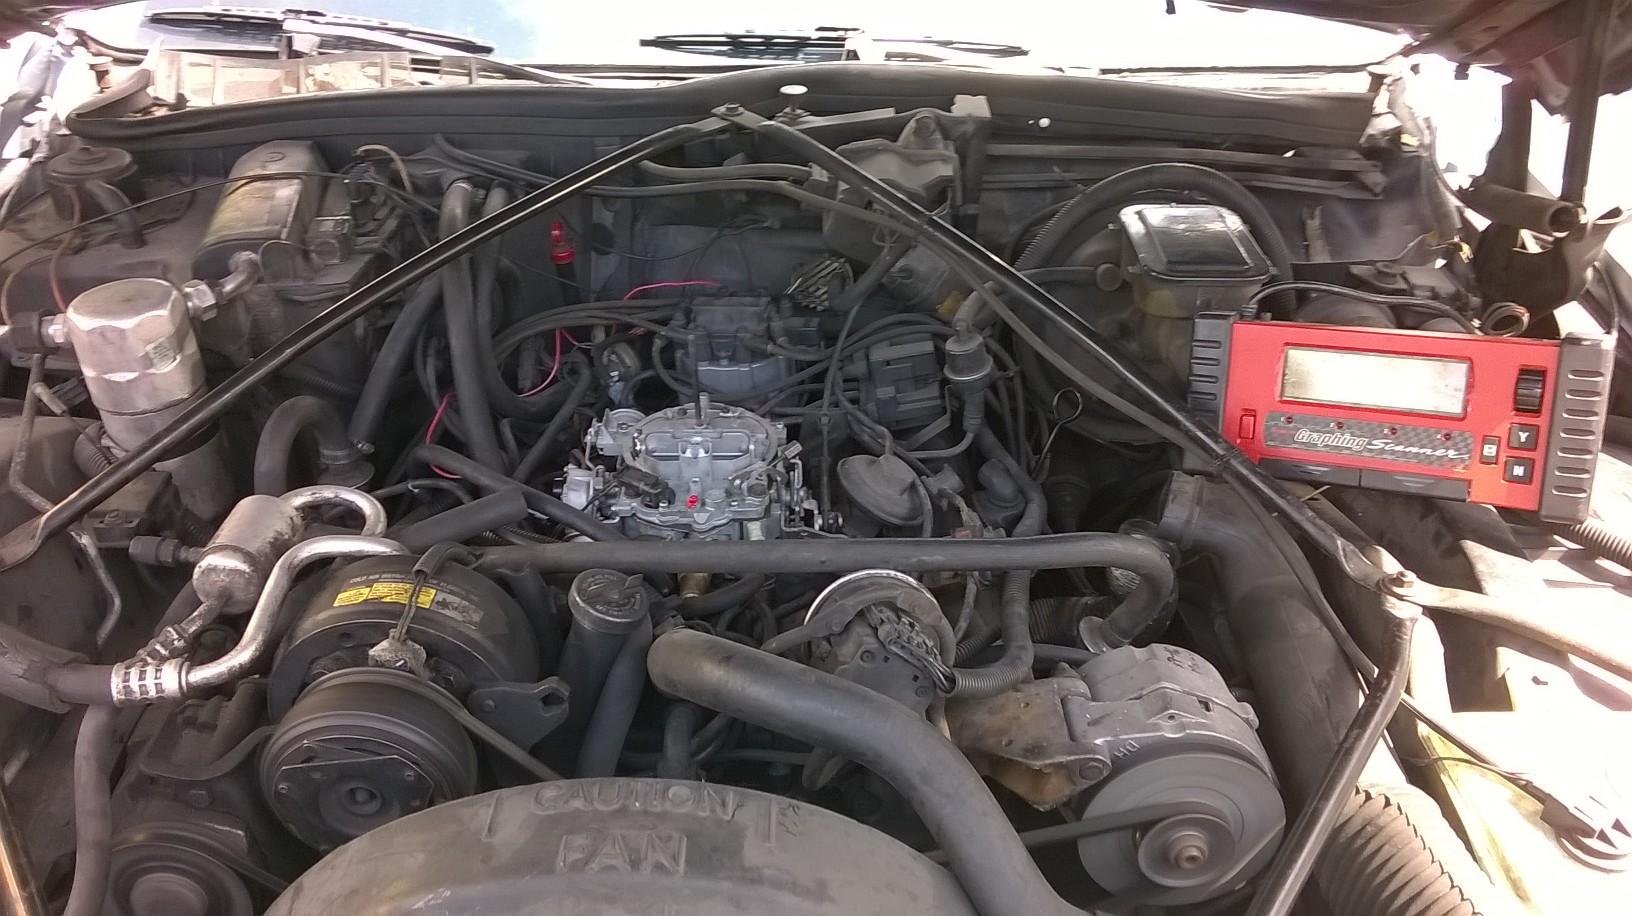 1987 Cadillac 5.0L